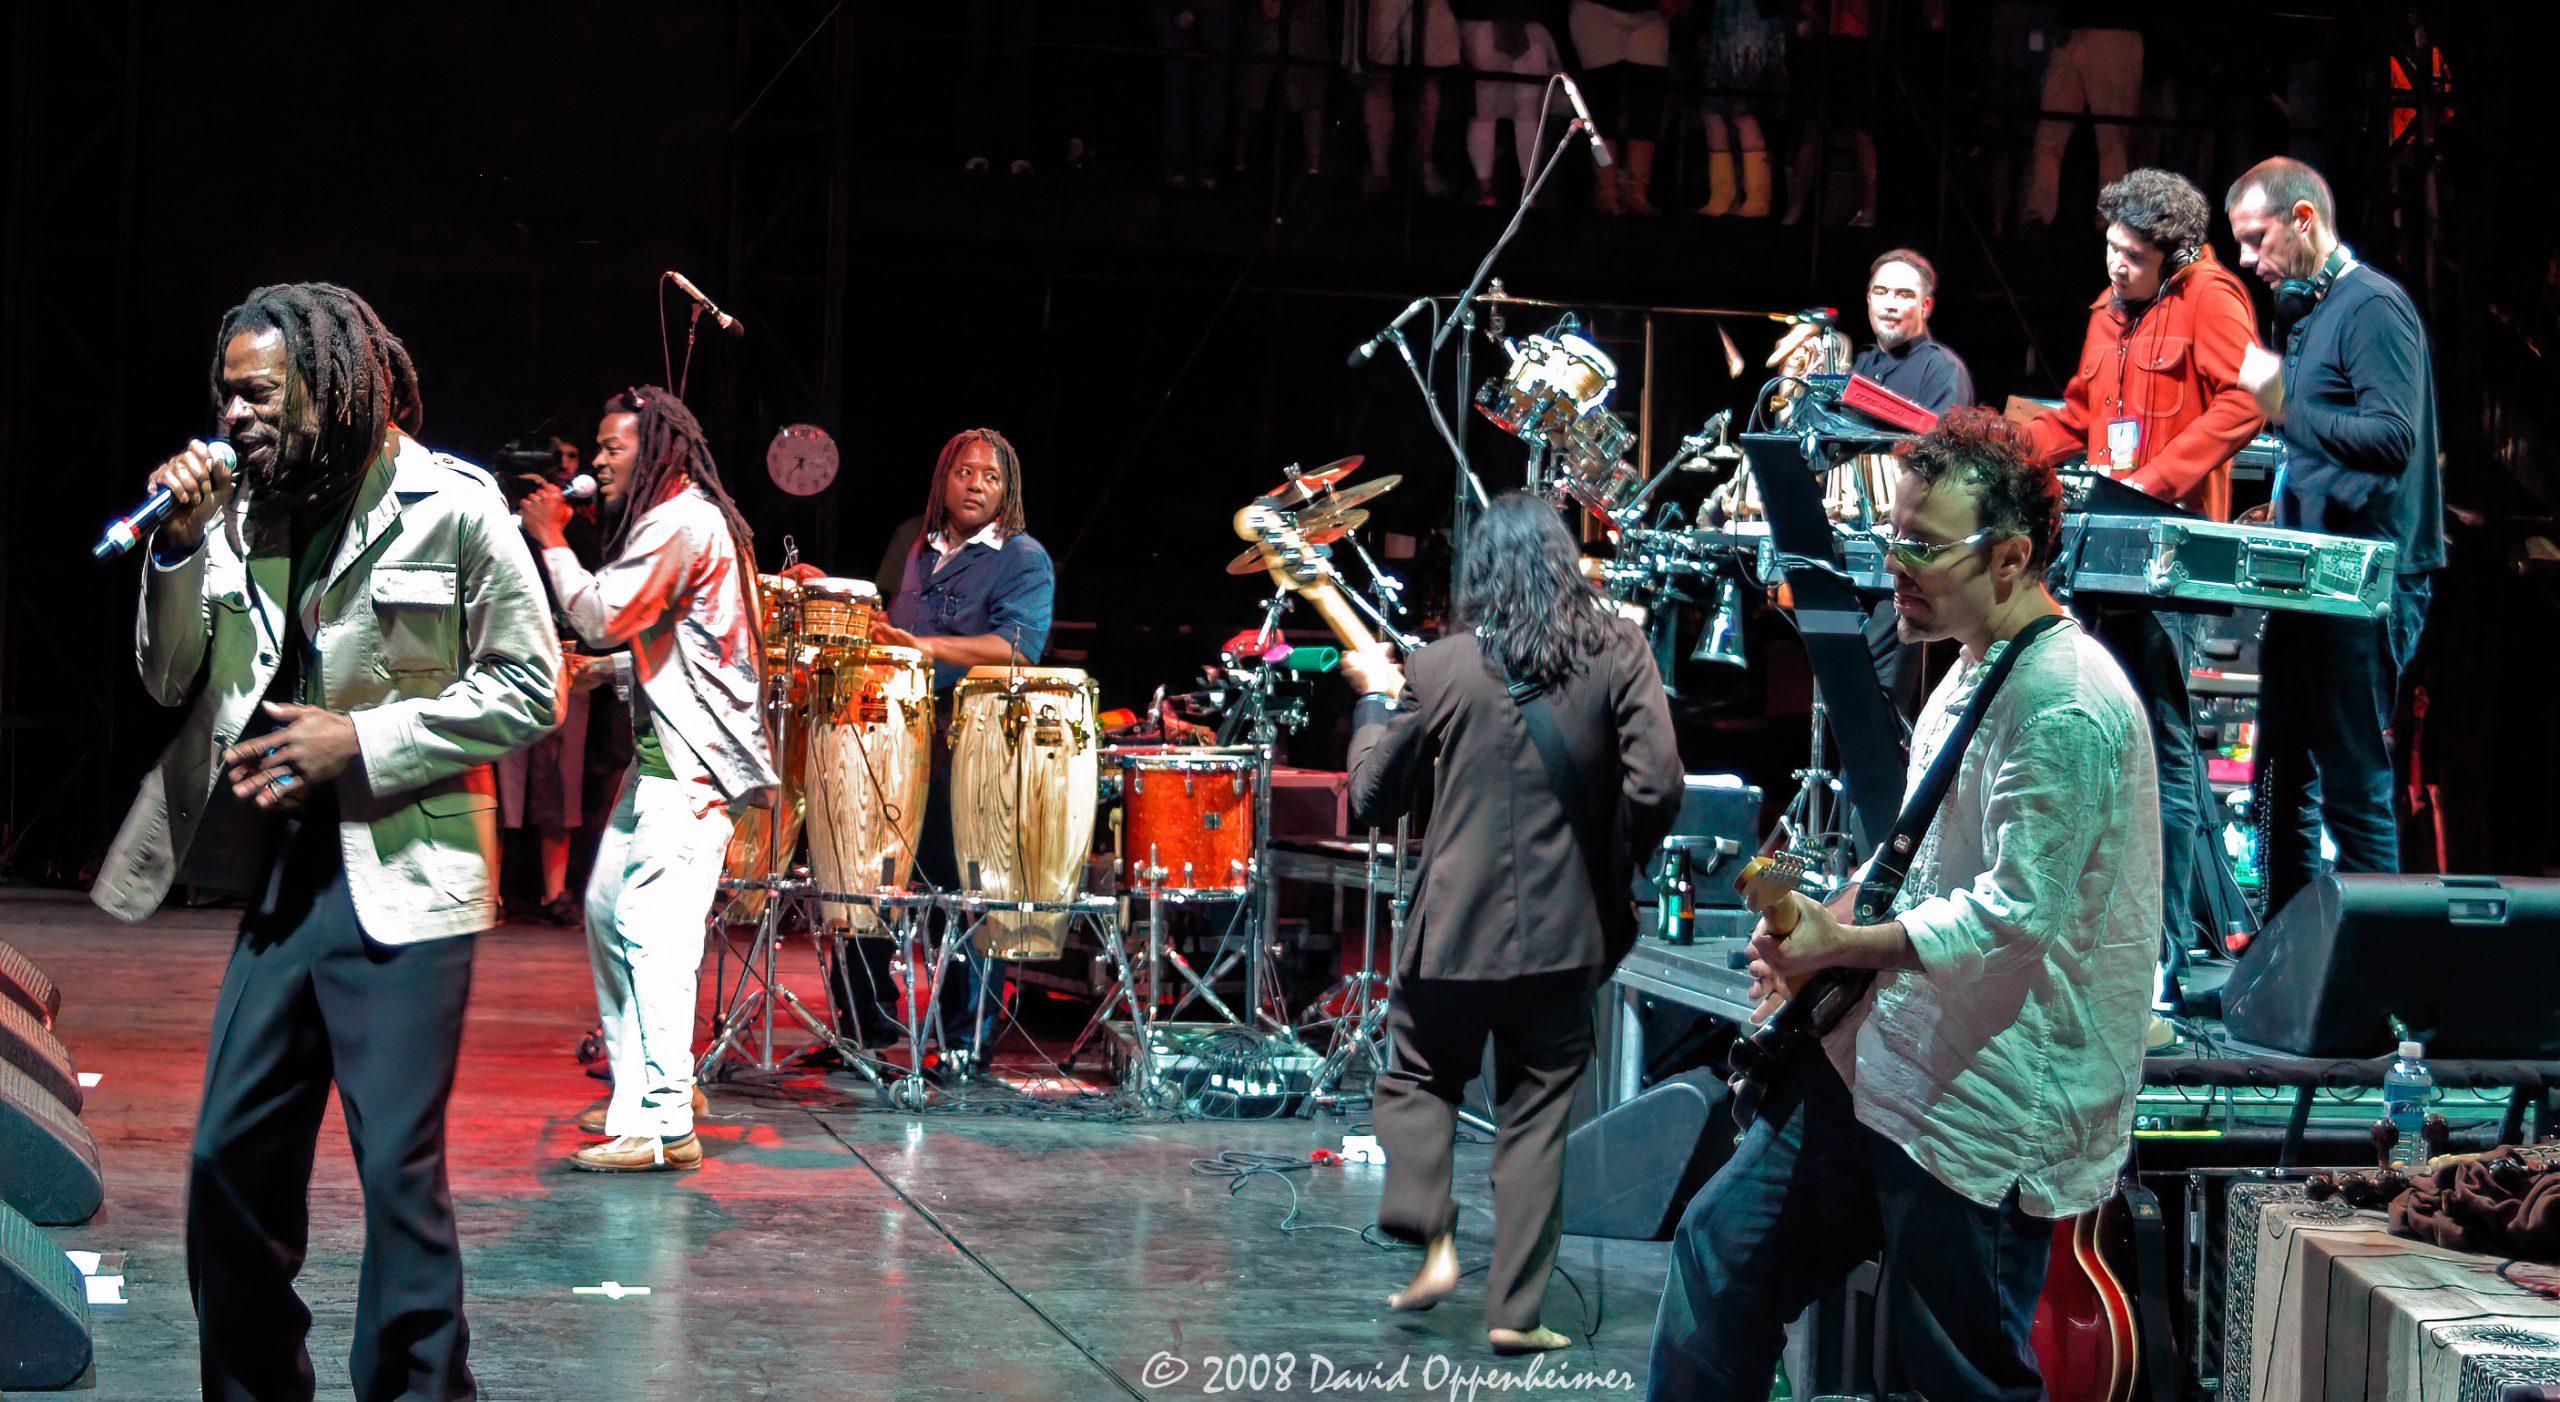 Thievery Corporation at Langerado Music Festival 2008